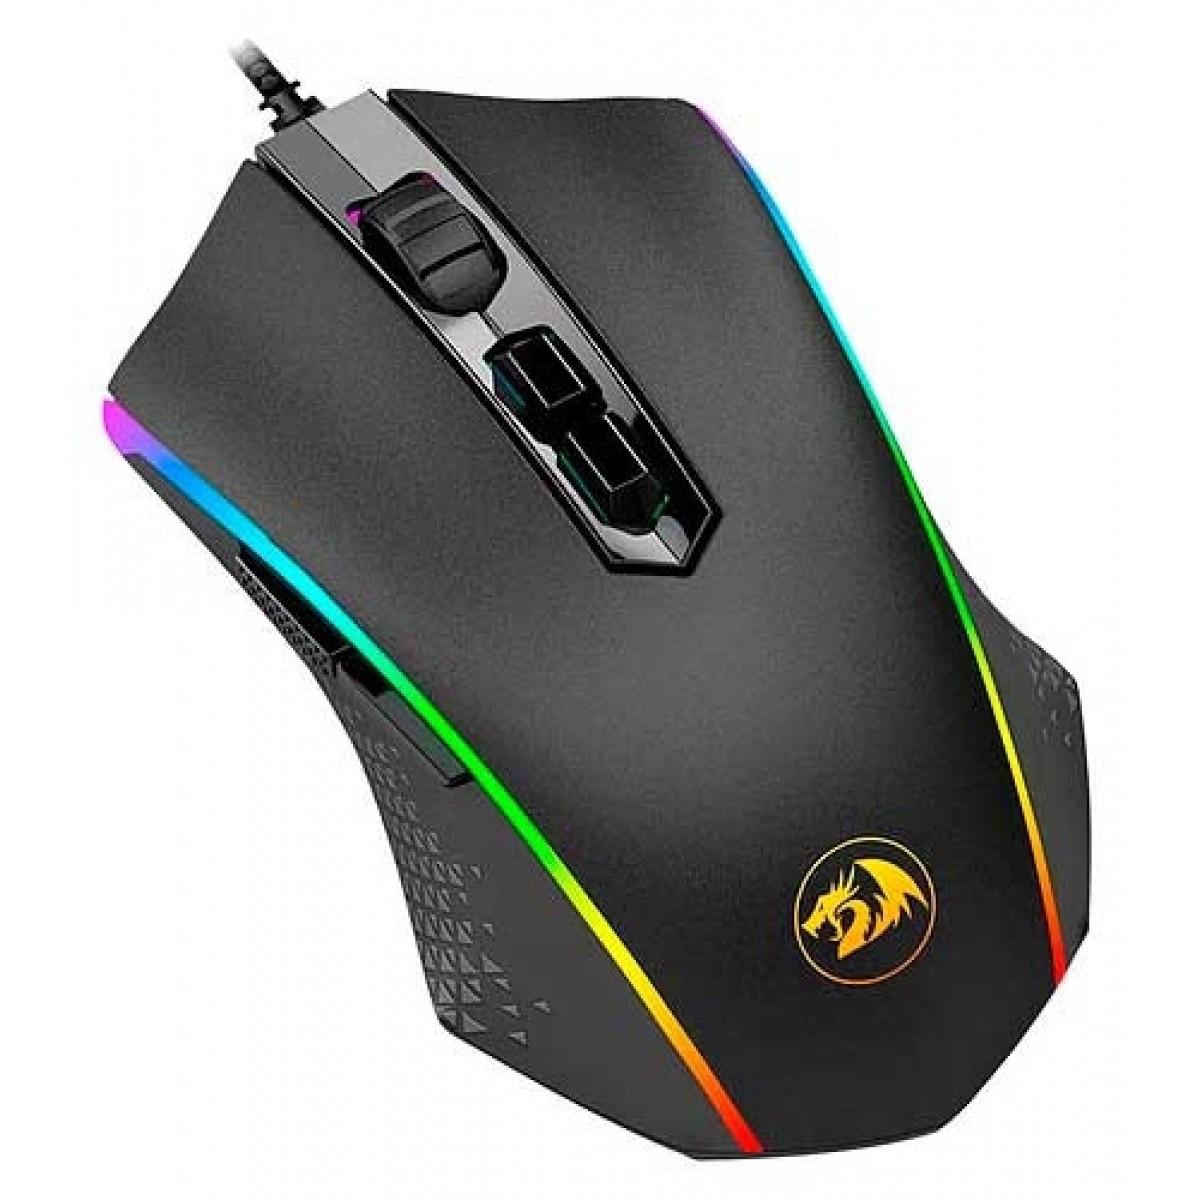 Mouse Gamer Redragon Memeanlion M710 RGB, 10000 DPI, 10 Botões, Black